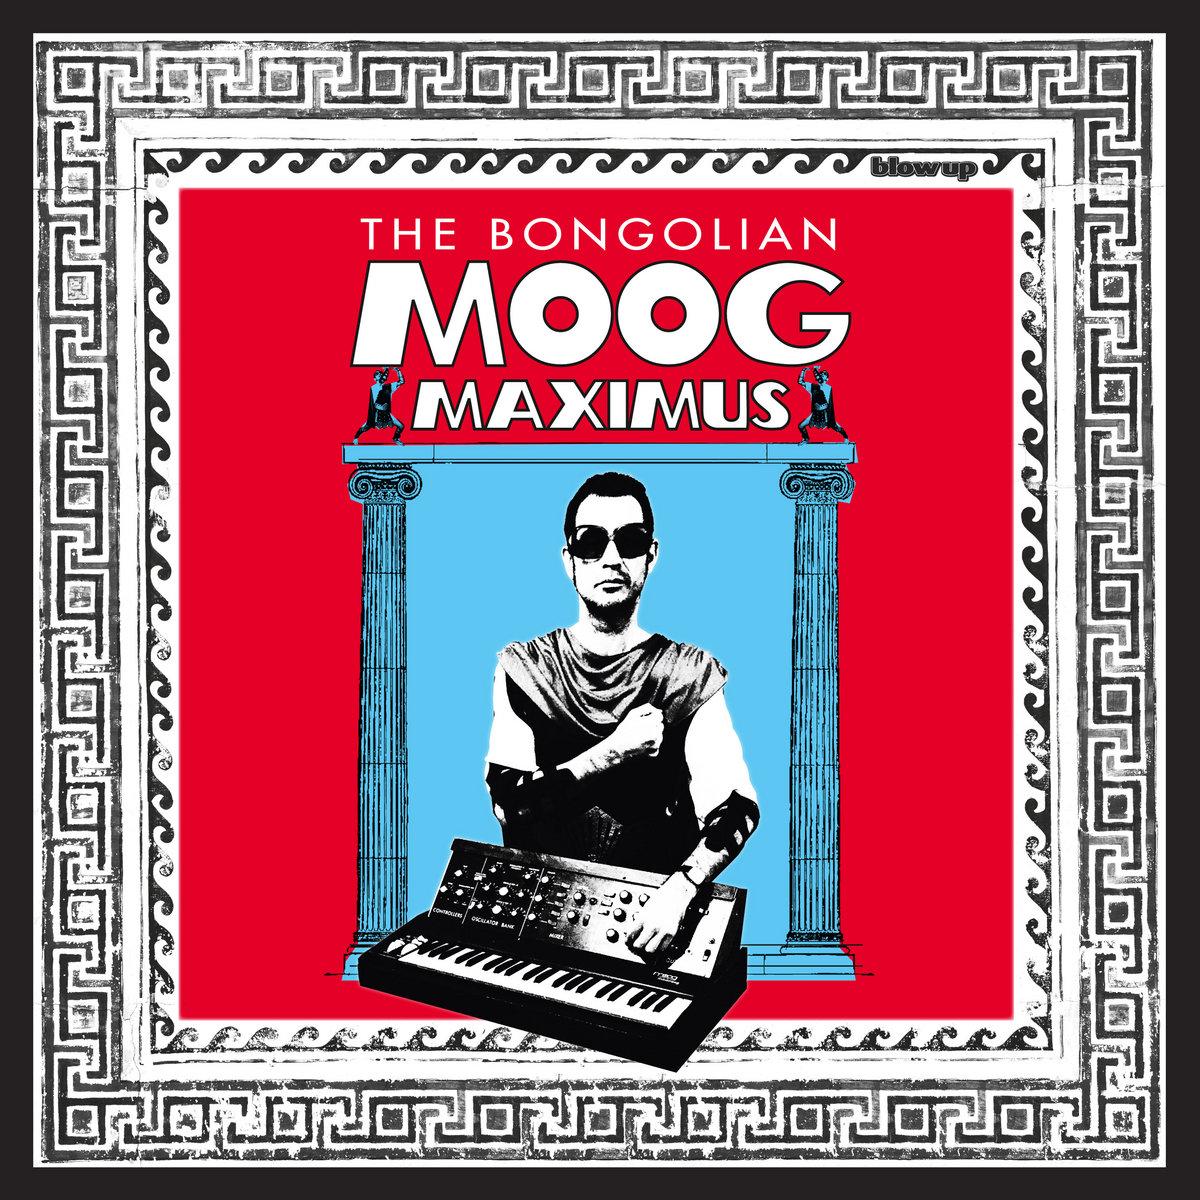 Moog Maximus | Blow Up Records